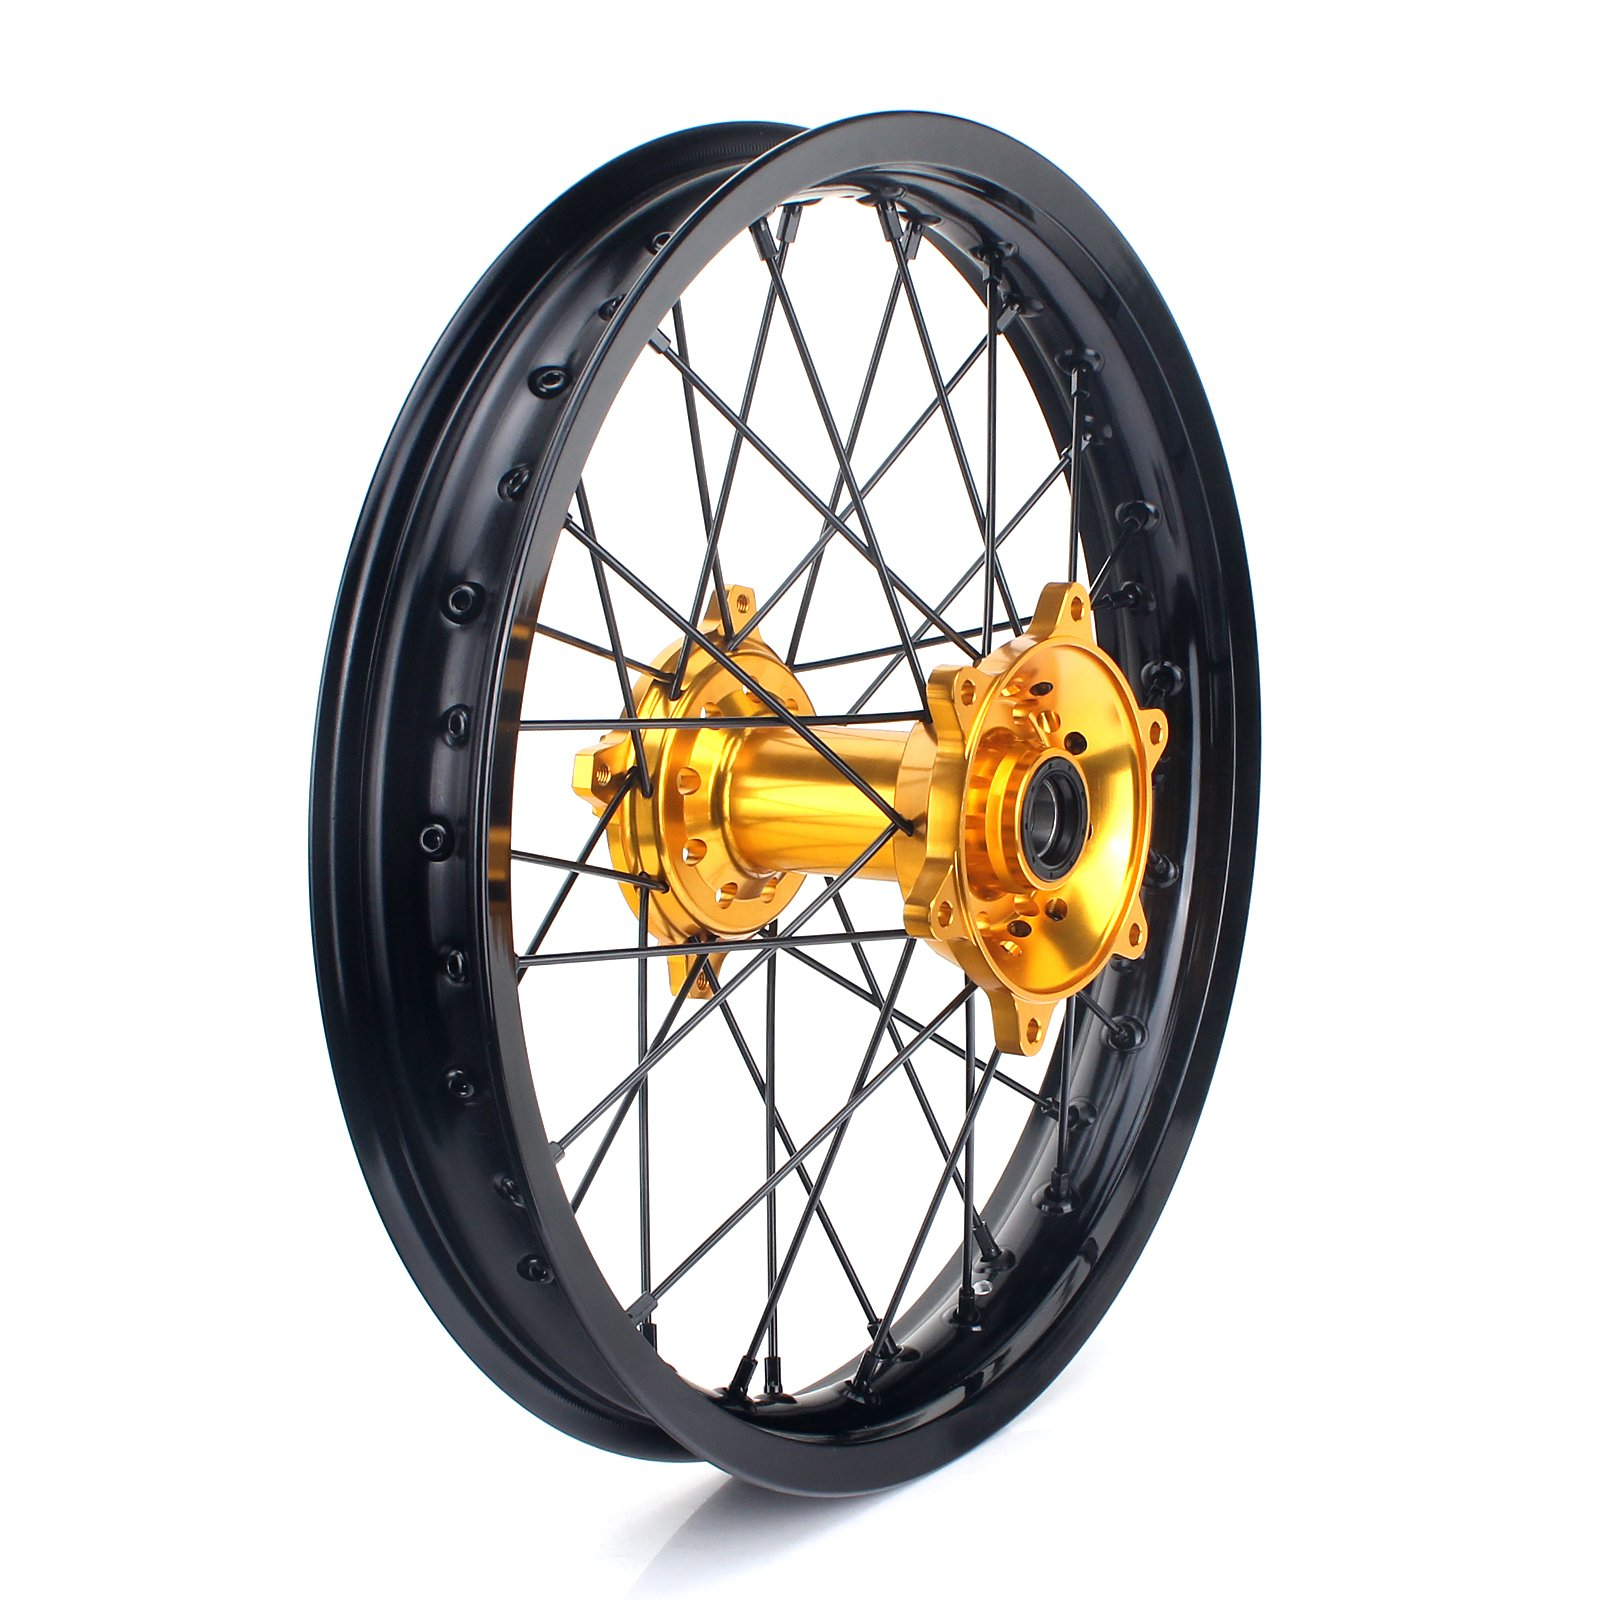 TARAZON 19 x 2.15 MX Rear Complete Wheel Kit Rim Spokes Gold Hub for Suzuki RMZ250 2007-2017 RMZ450 2005-2017 by TARAZON (Image #2)